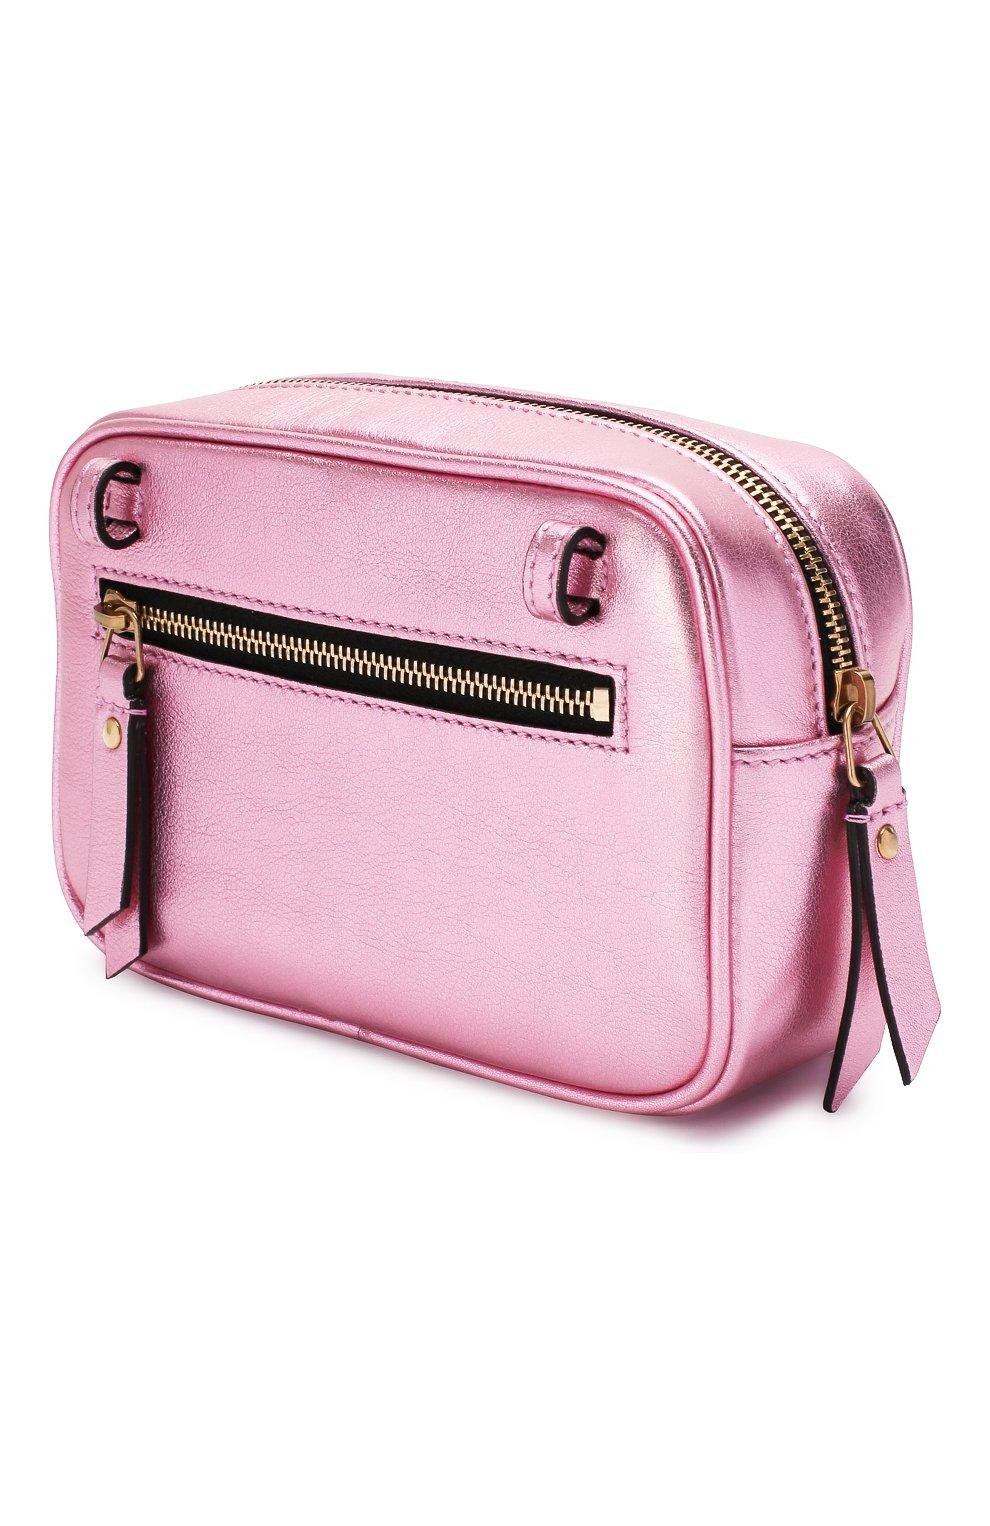 Женская поясная сумка lou SAINT LAURENT розового цвета, арт. 534817/09E0W   Фото 3